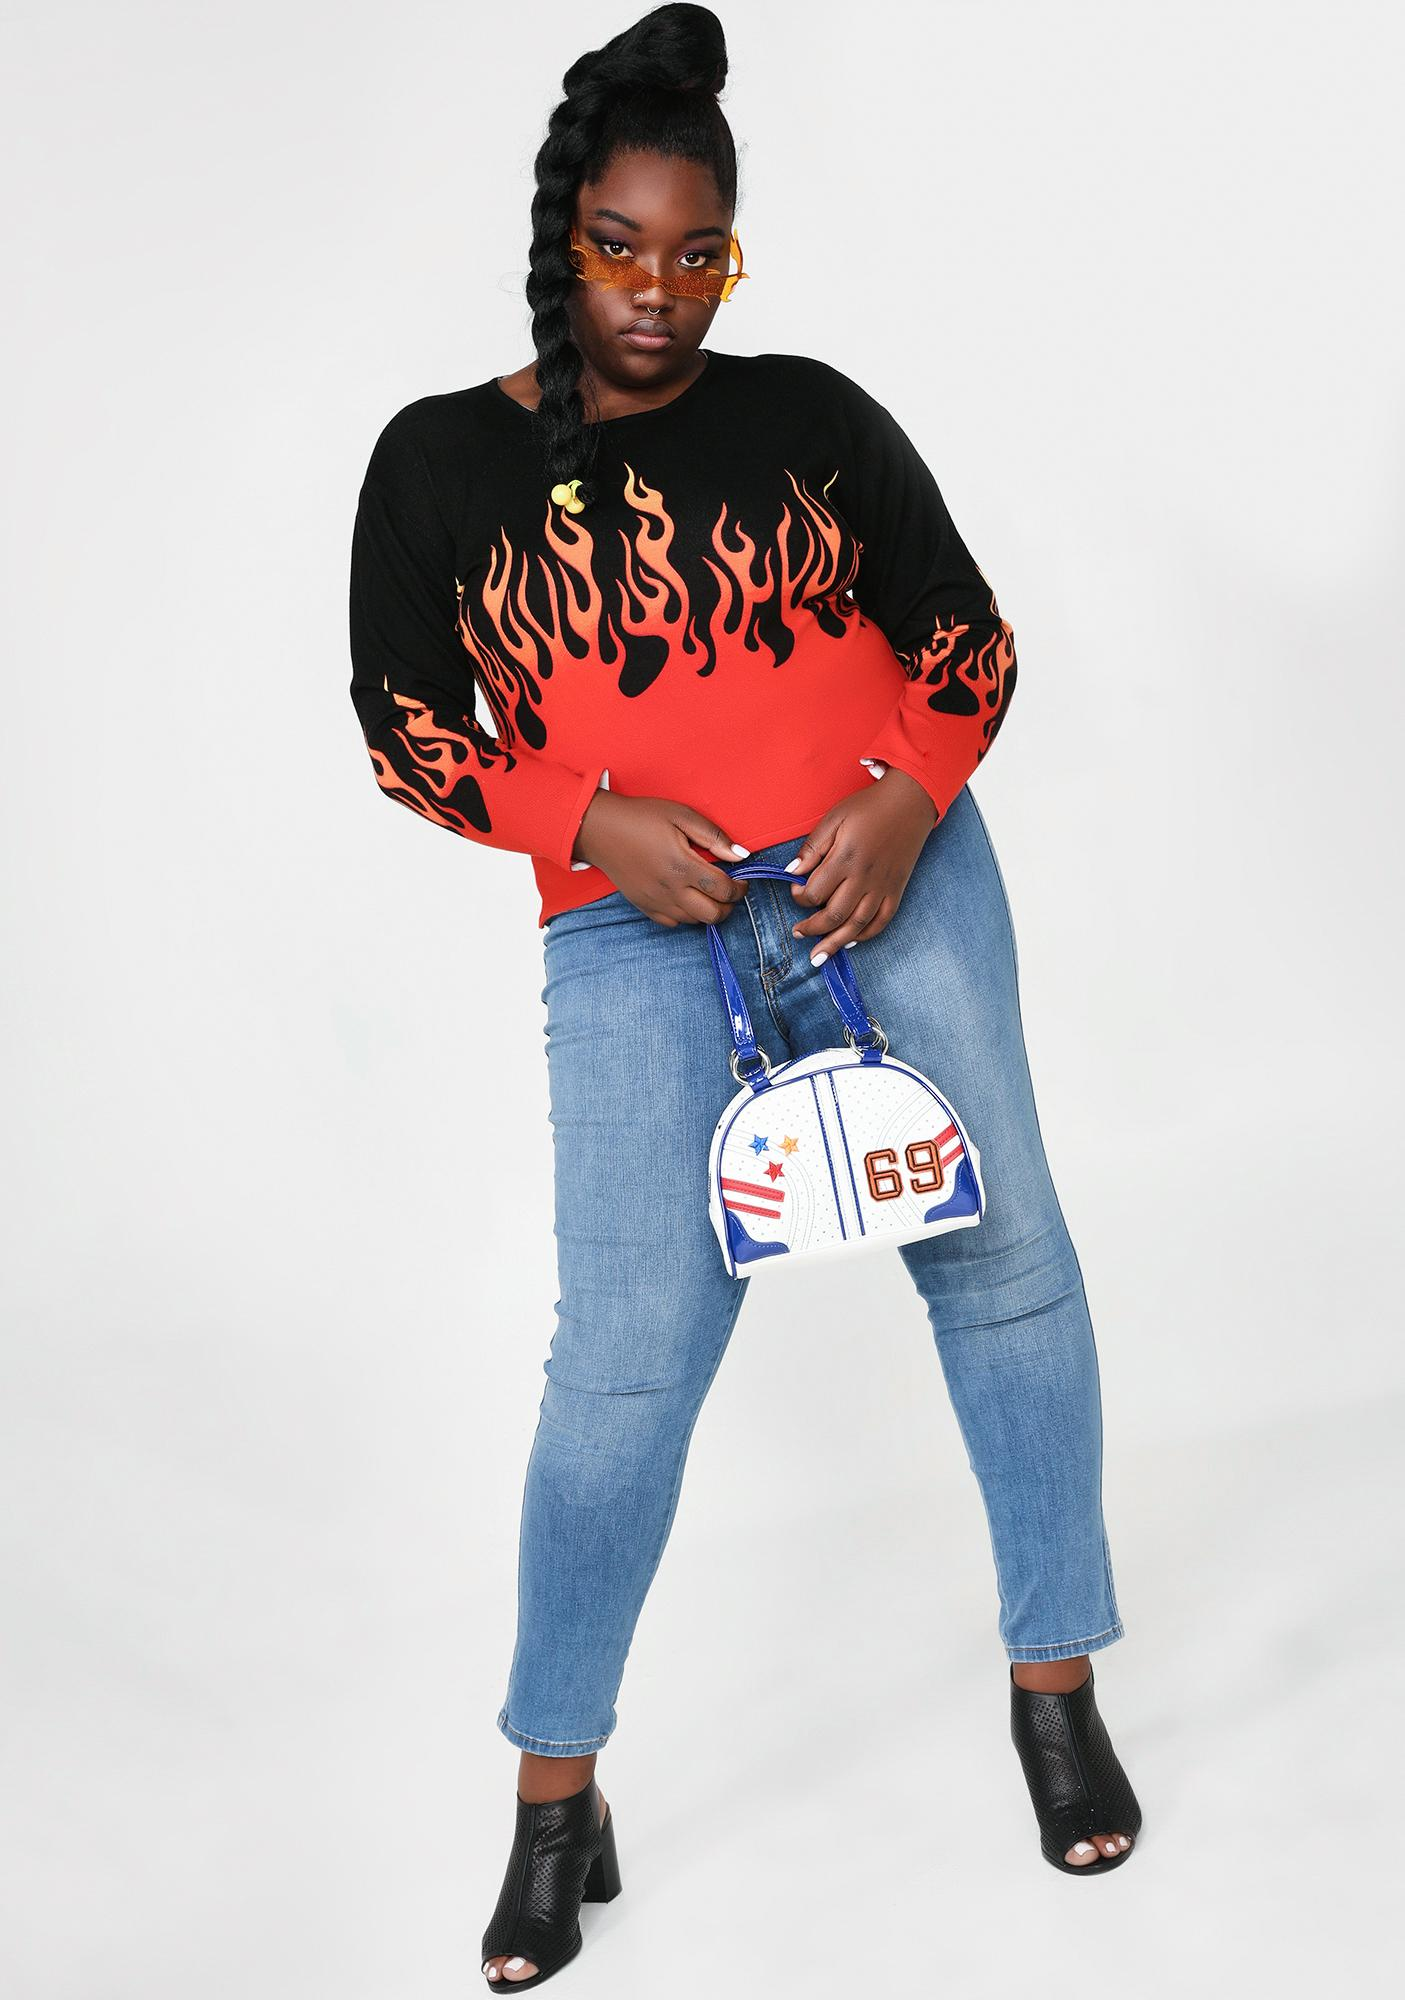 HOROSCOPEZ BB Blaze It Up Flame Sweater